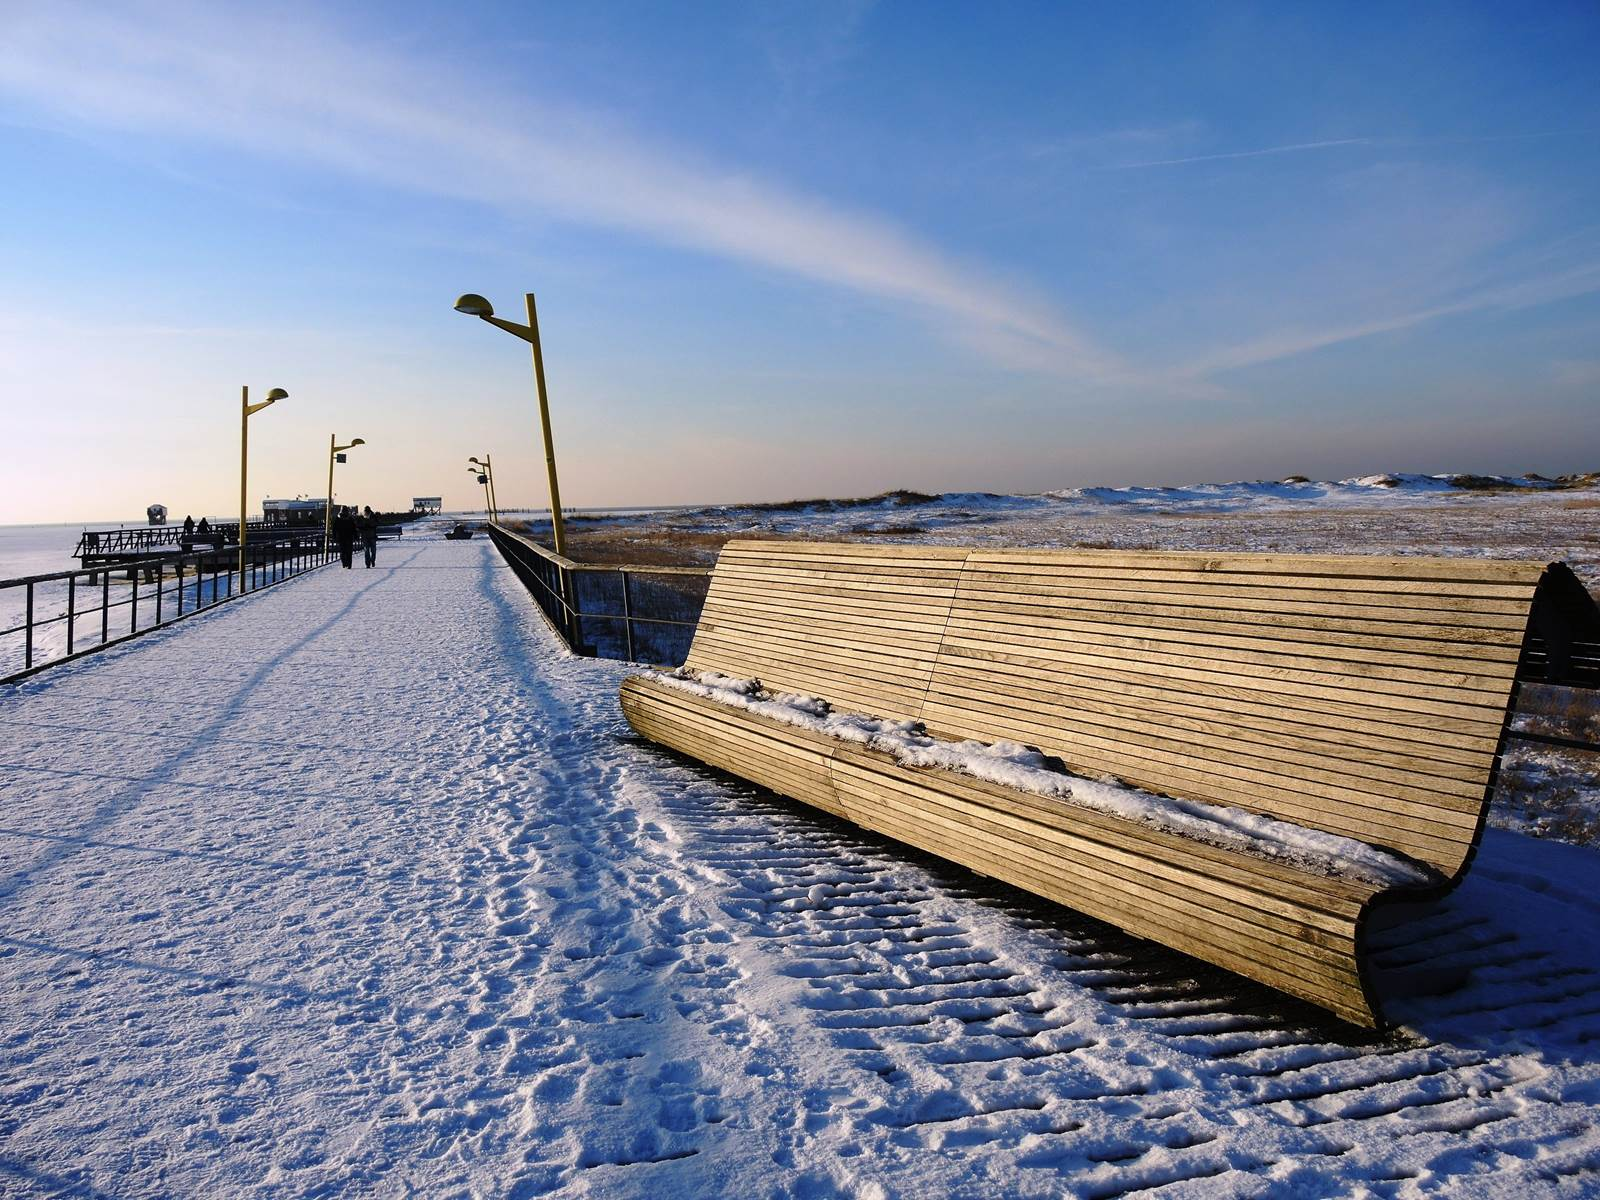 Winter in St. Peter-Ording bei der Bude54